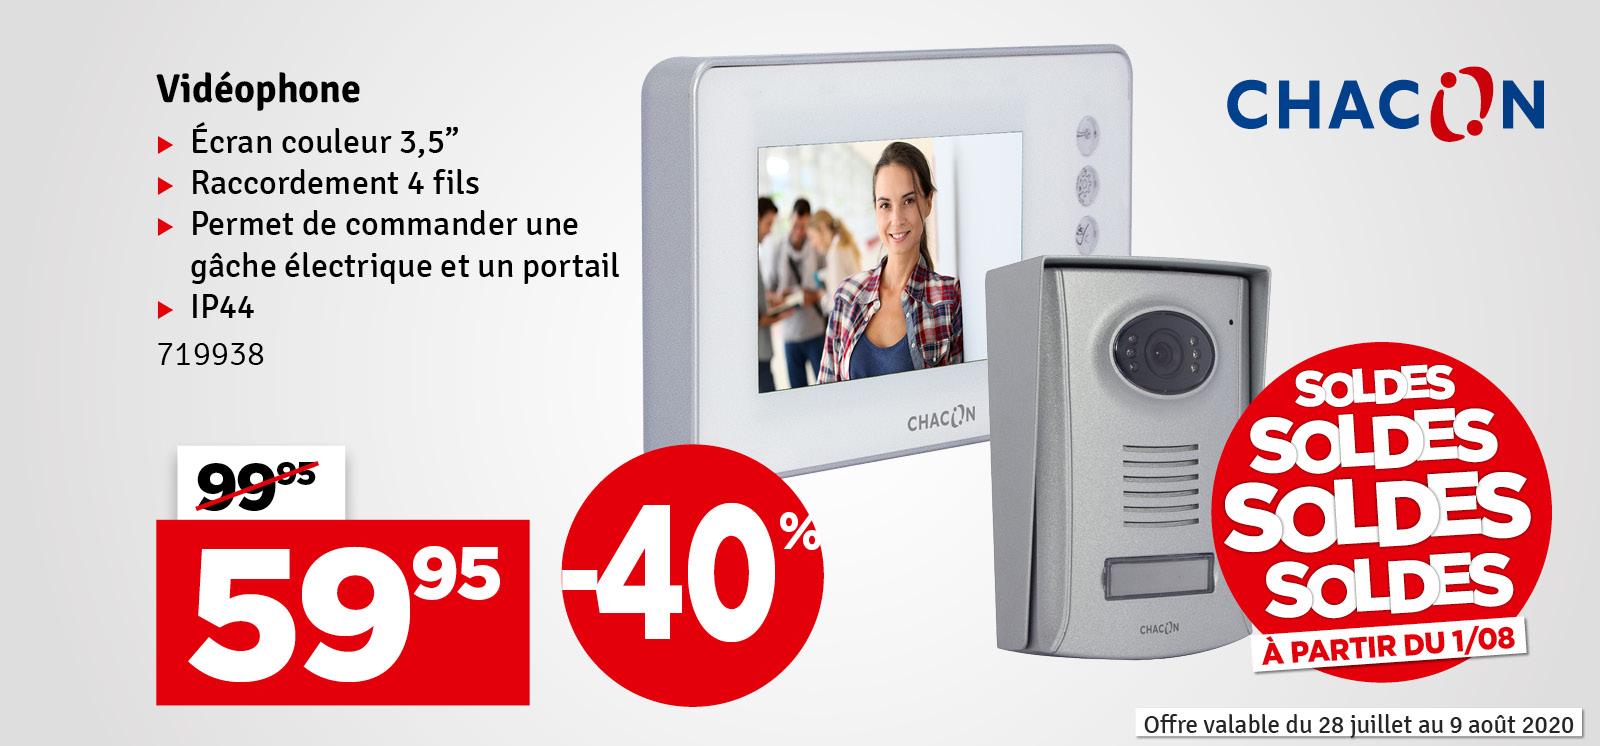 "Promo - Videophone 4 fils 3.5"" blanc"